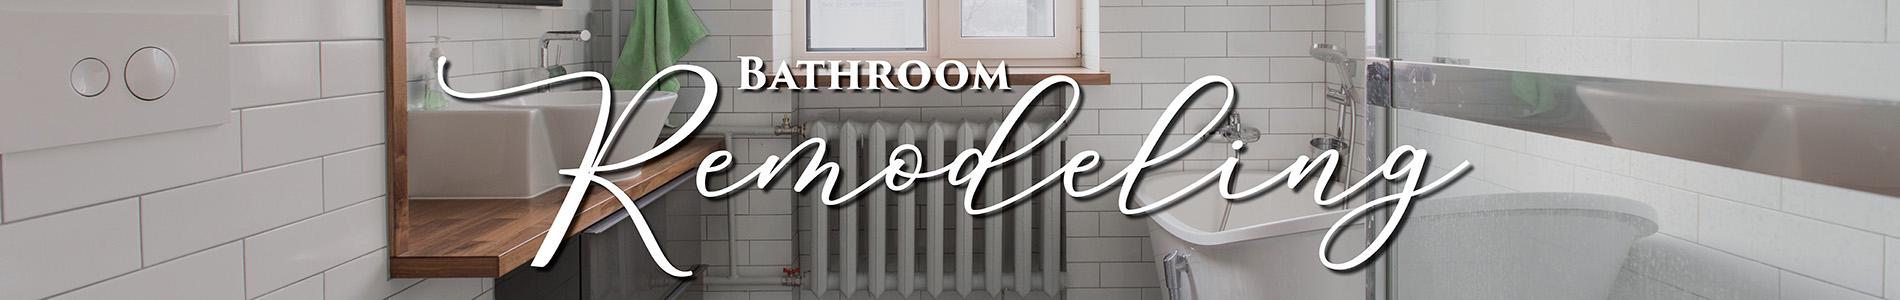 Bathroom remodeling at Flooring USA